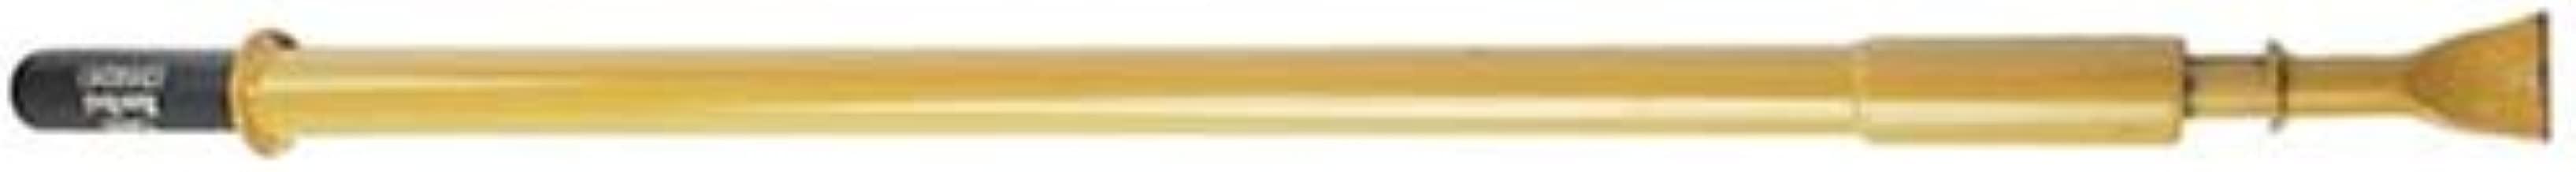 Ken-Tool 35926 Automotive Accessories